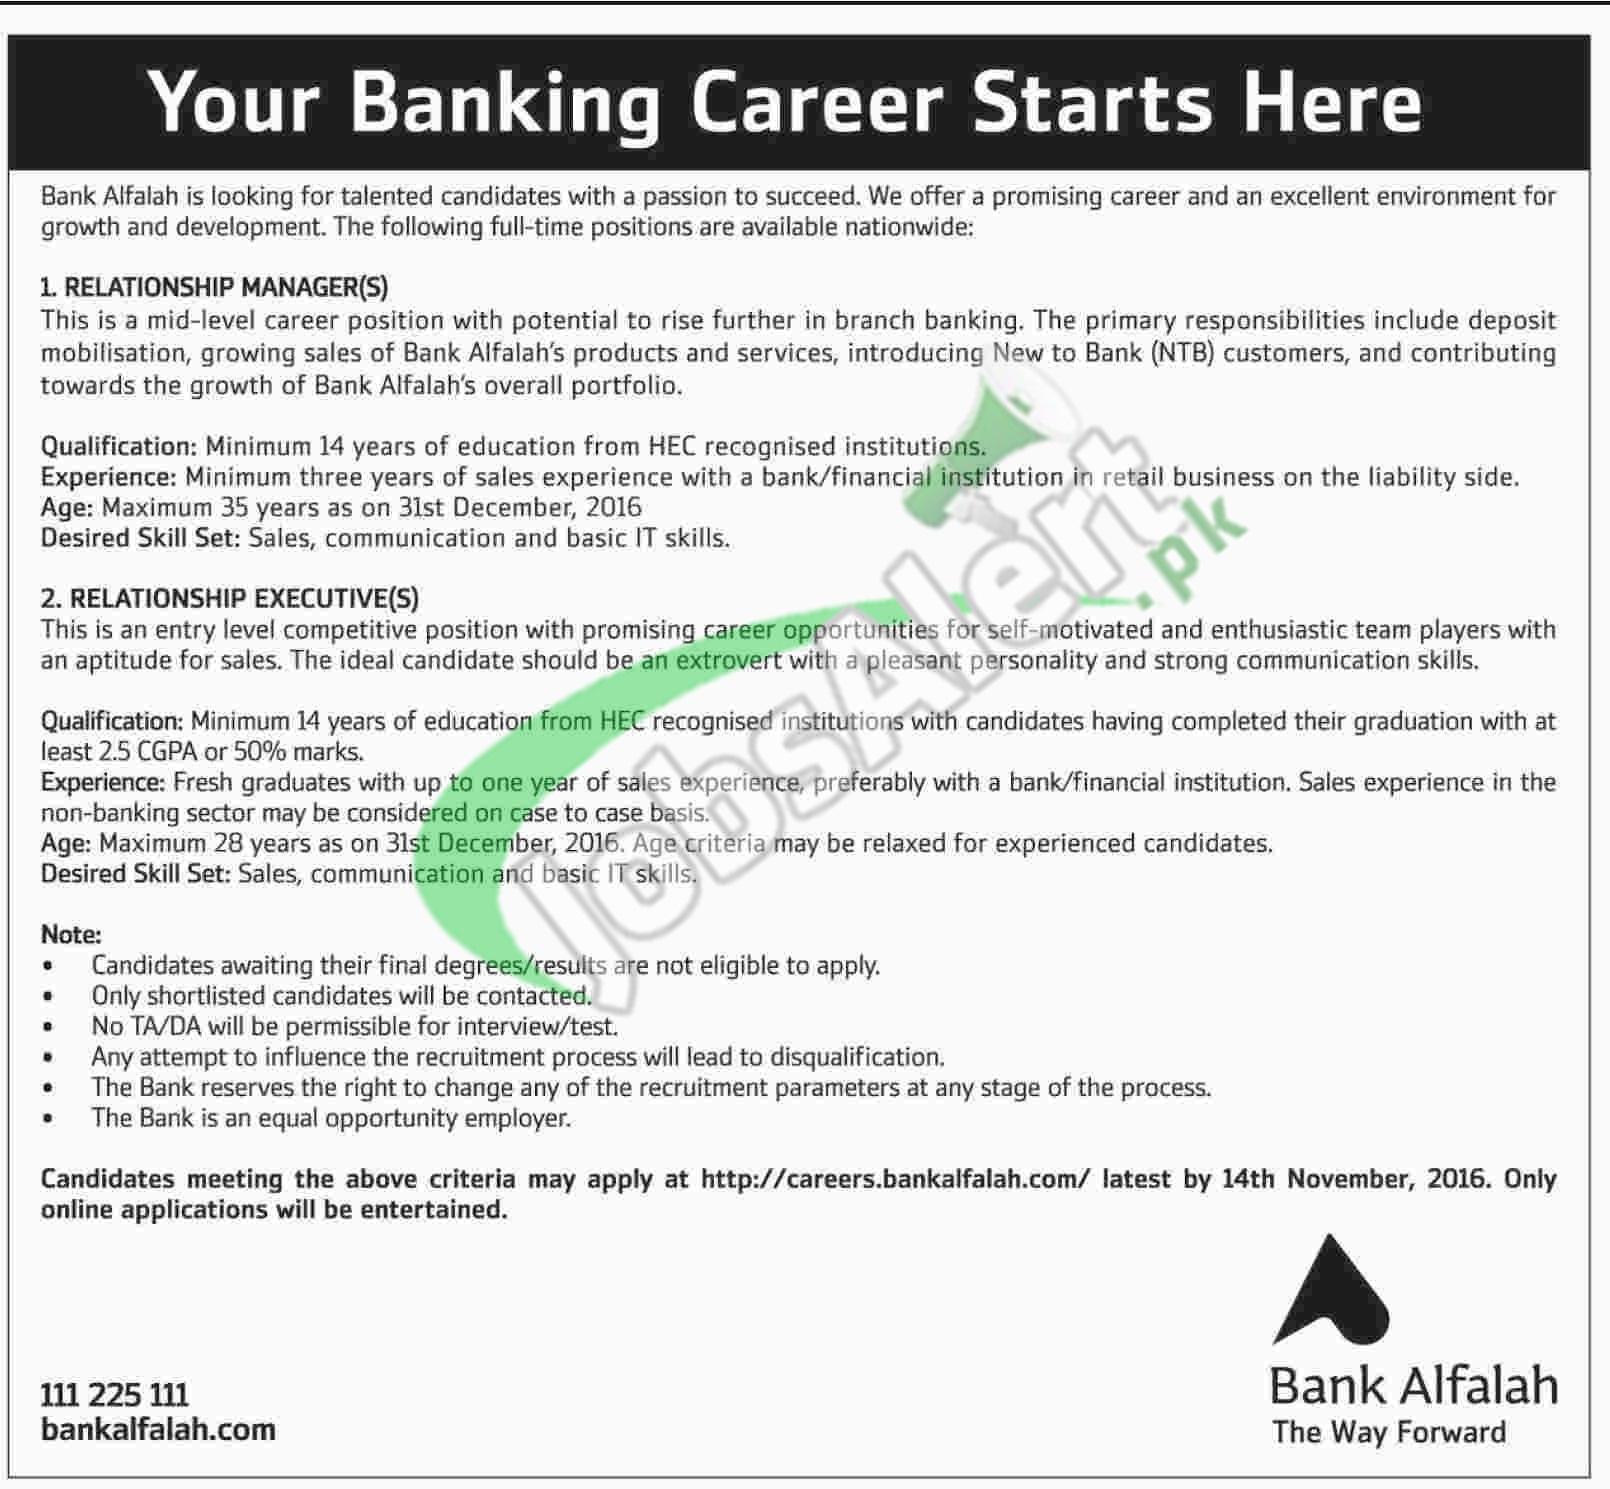 bank alfalah jobs 2016 apply career bankalfalah com click here